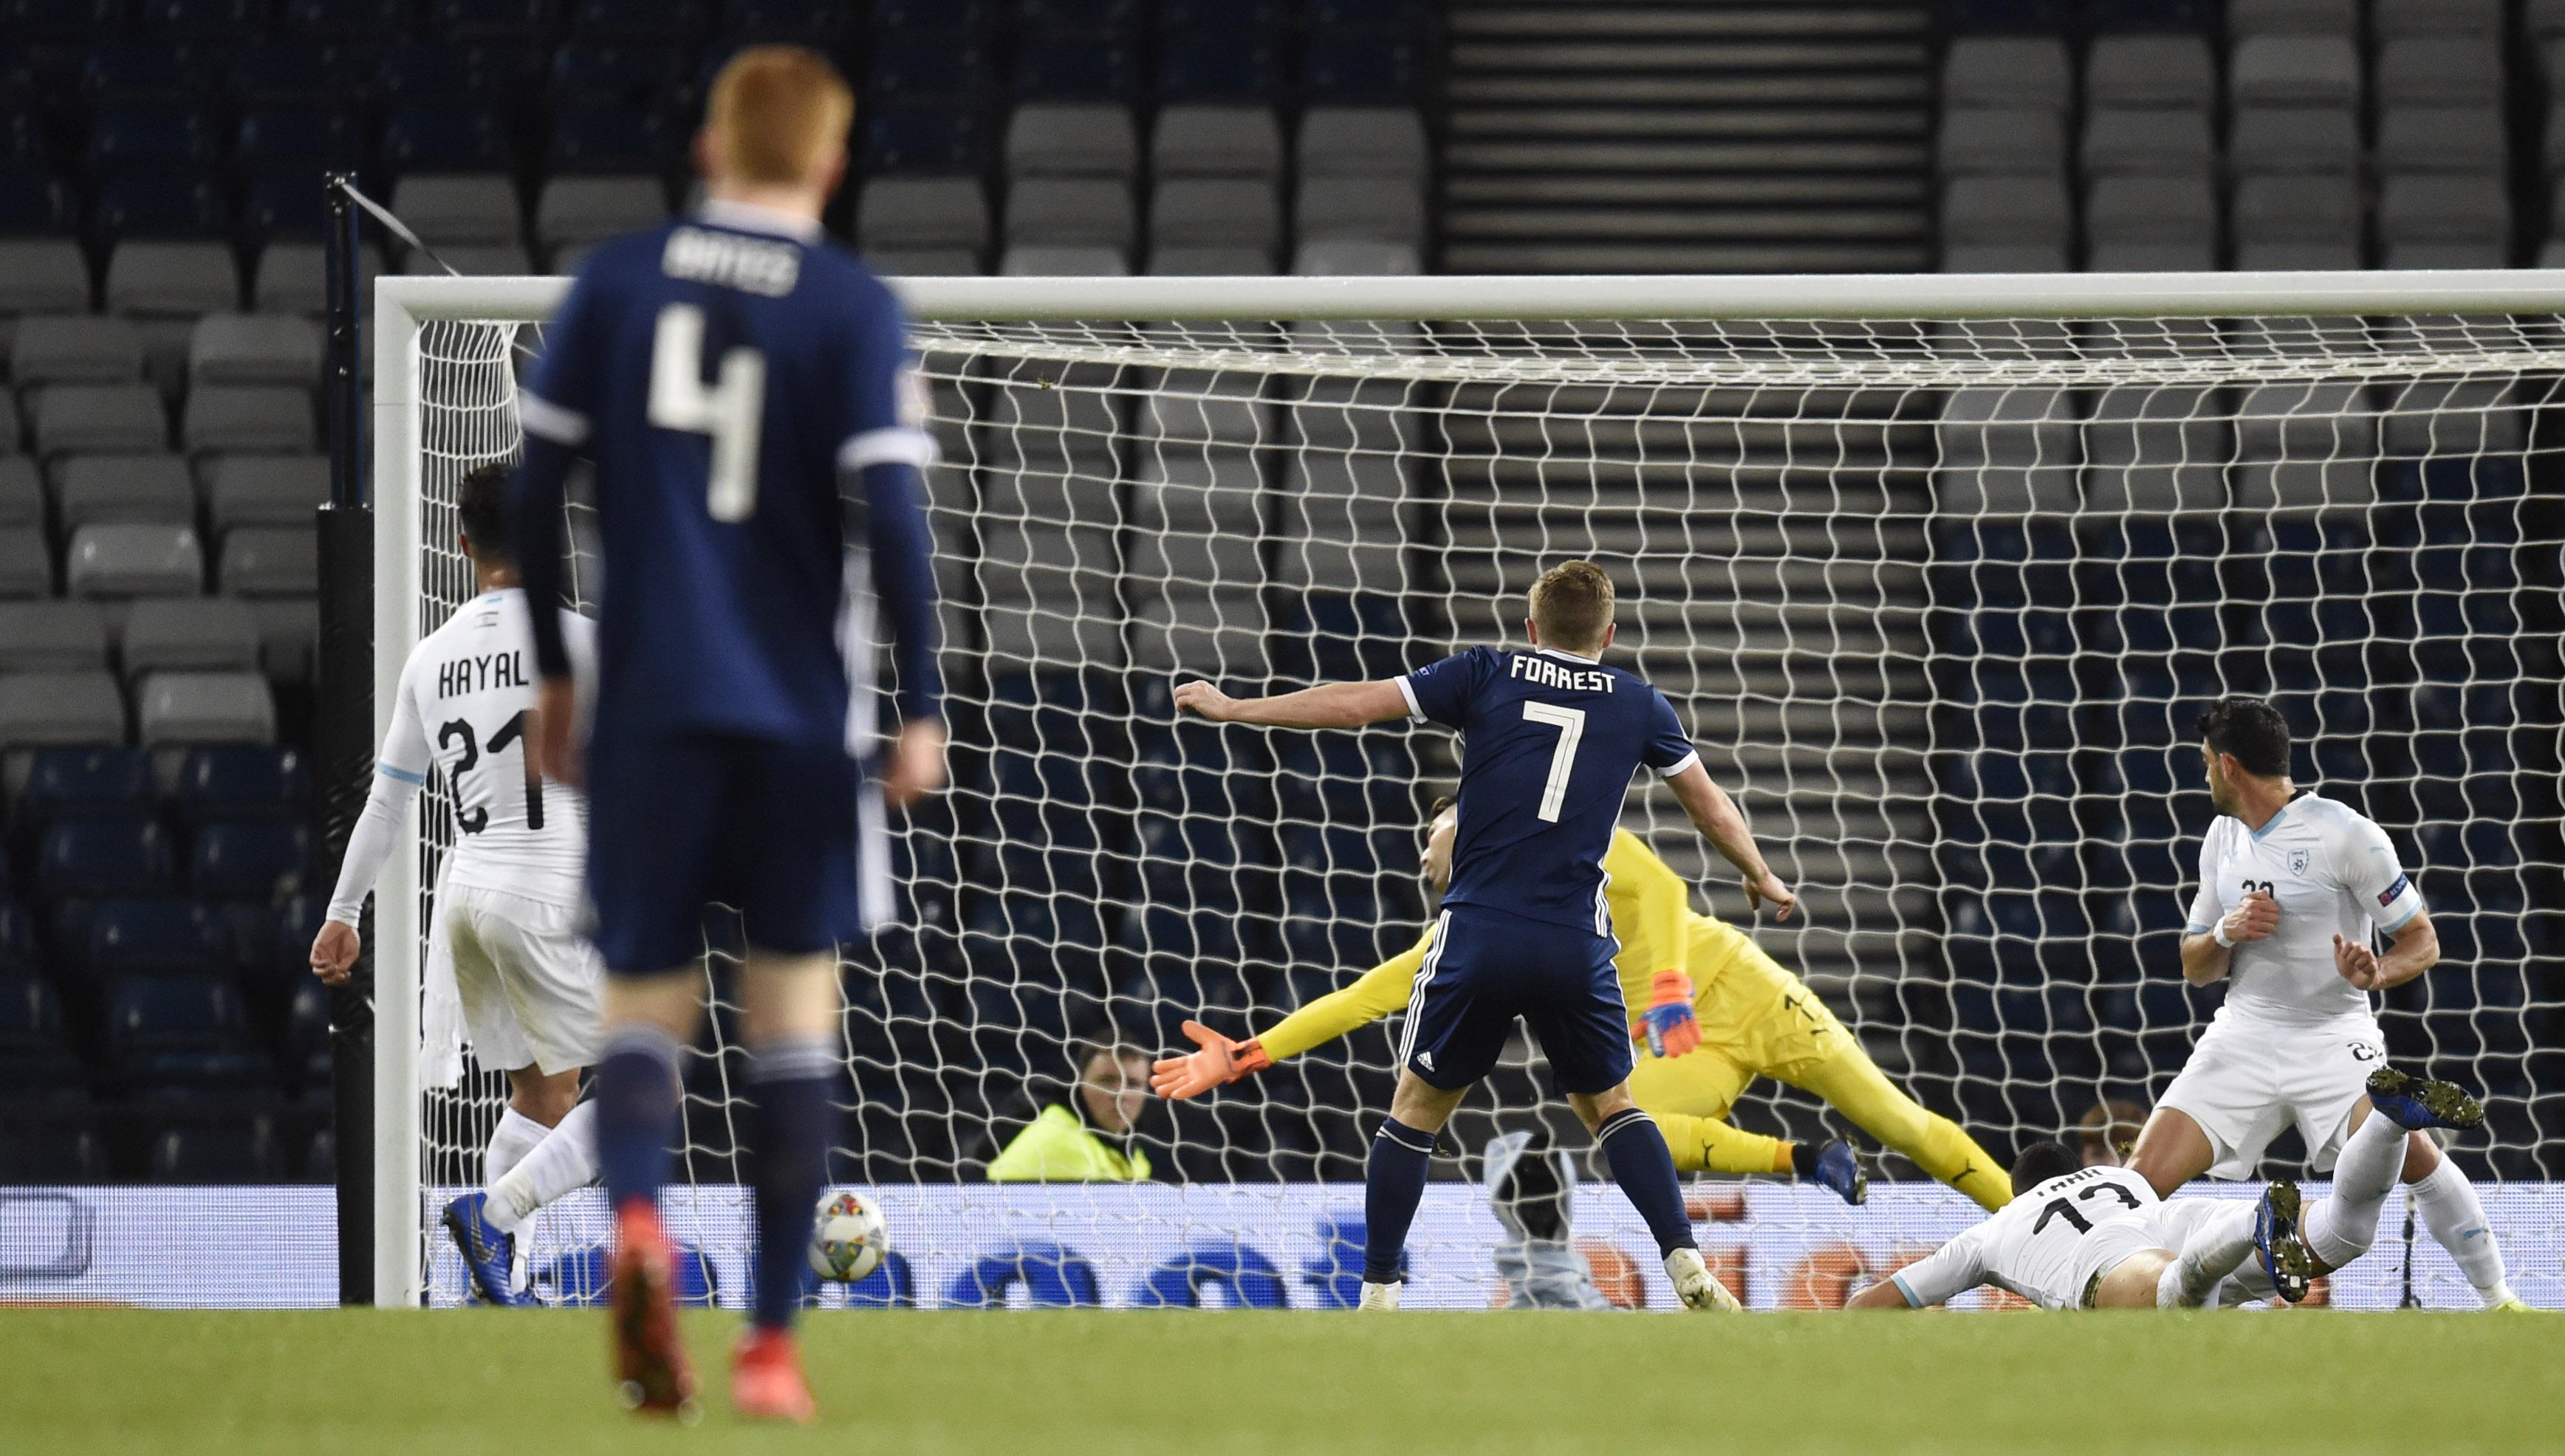 Nations League promotion will lift Scotland, says Paul Lambert